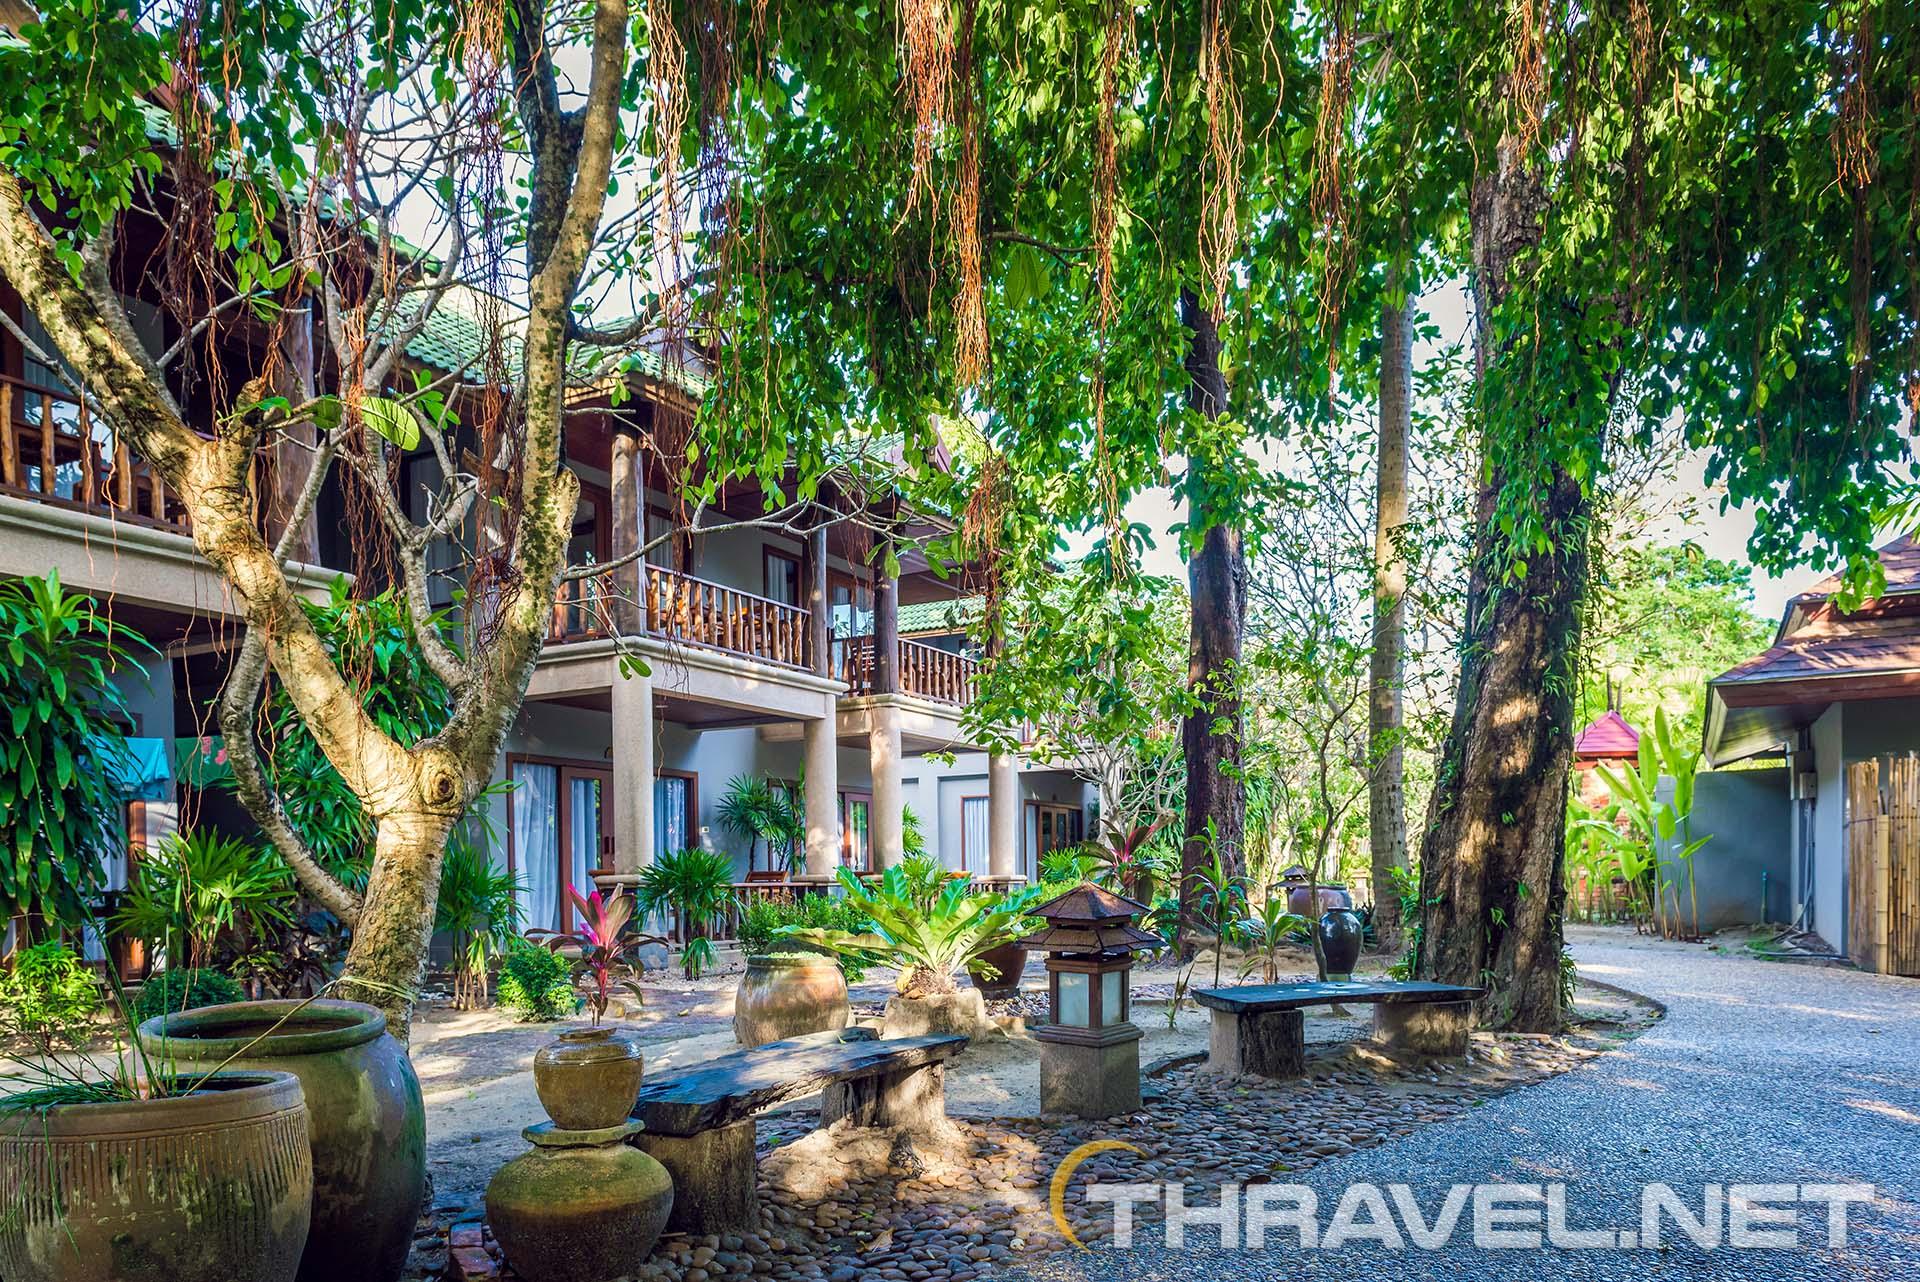 Railey-beach-hotels-garden-photo